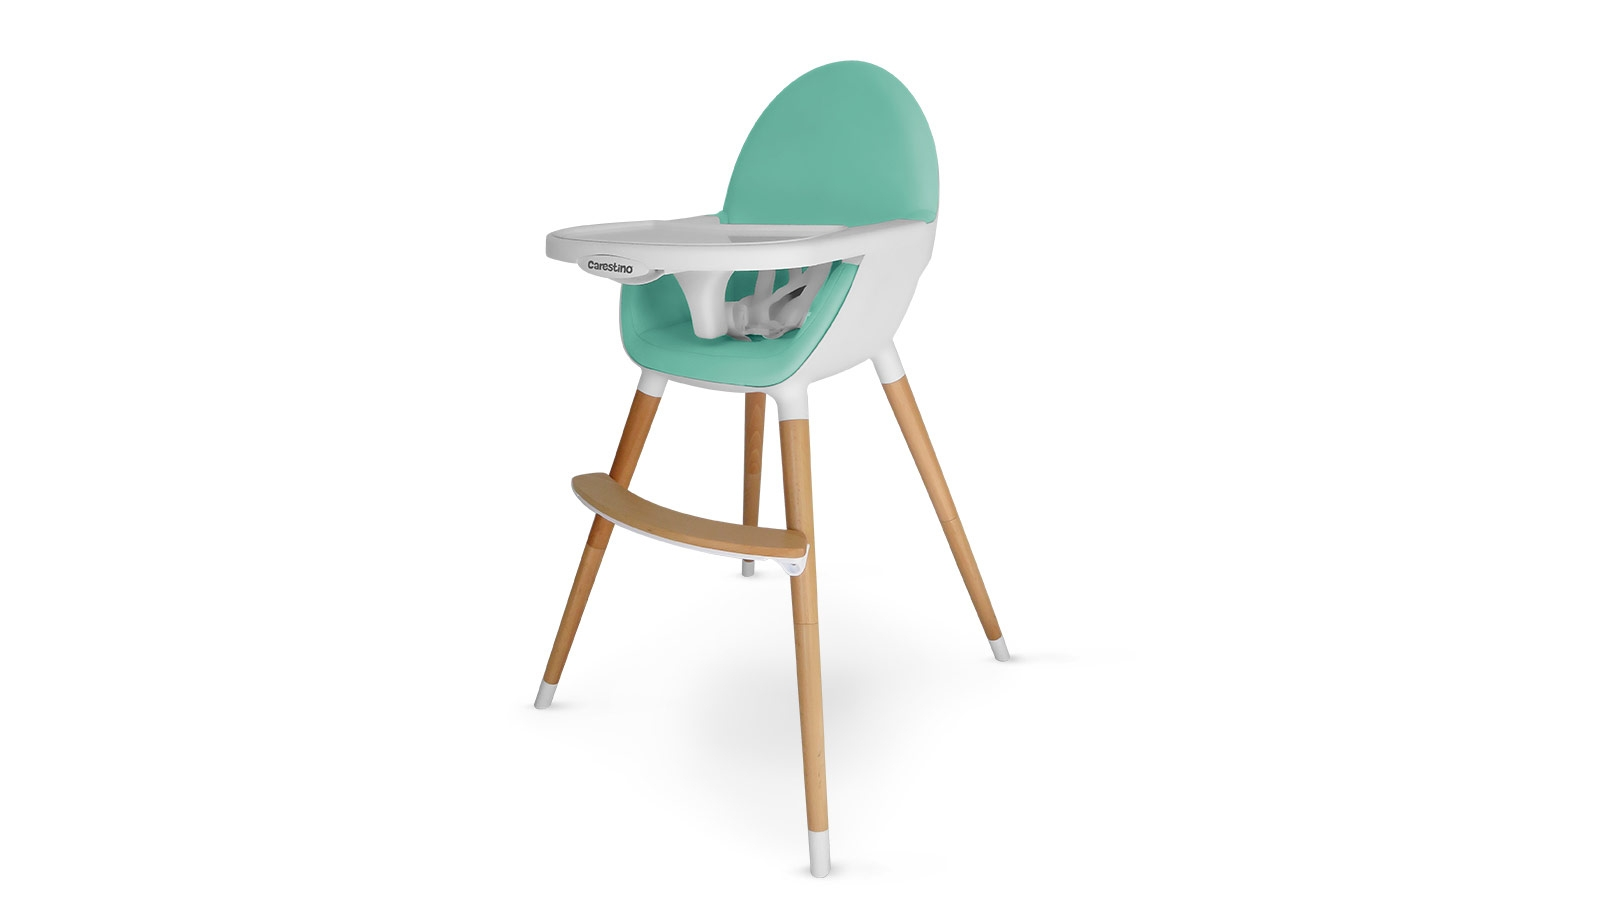 Carestino productos sillas sillas de comer silla de comer neo verde - Sillas de comer para bebes ...